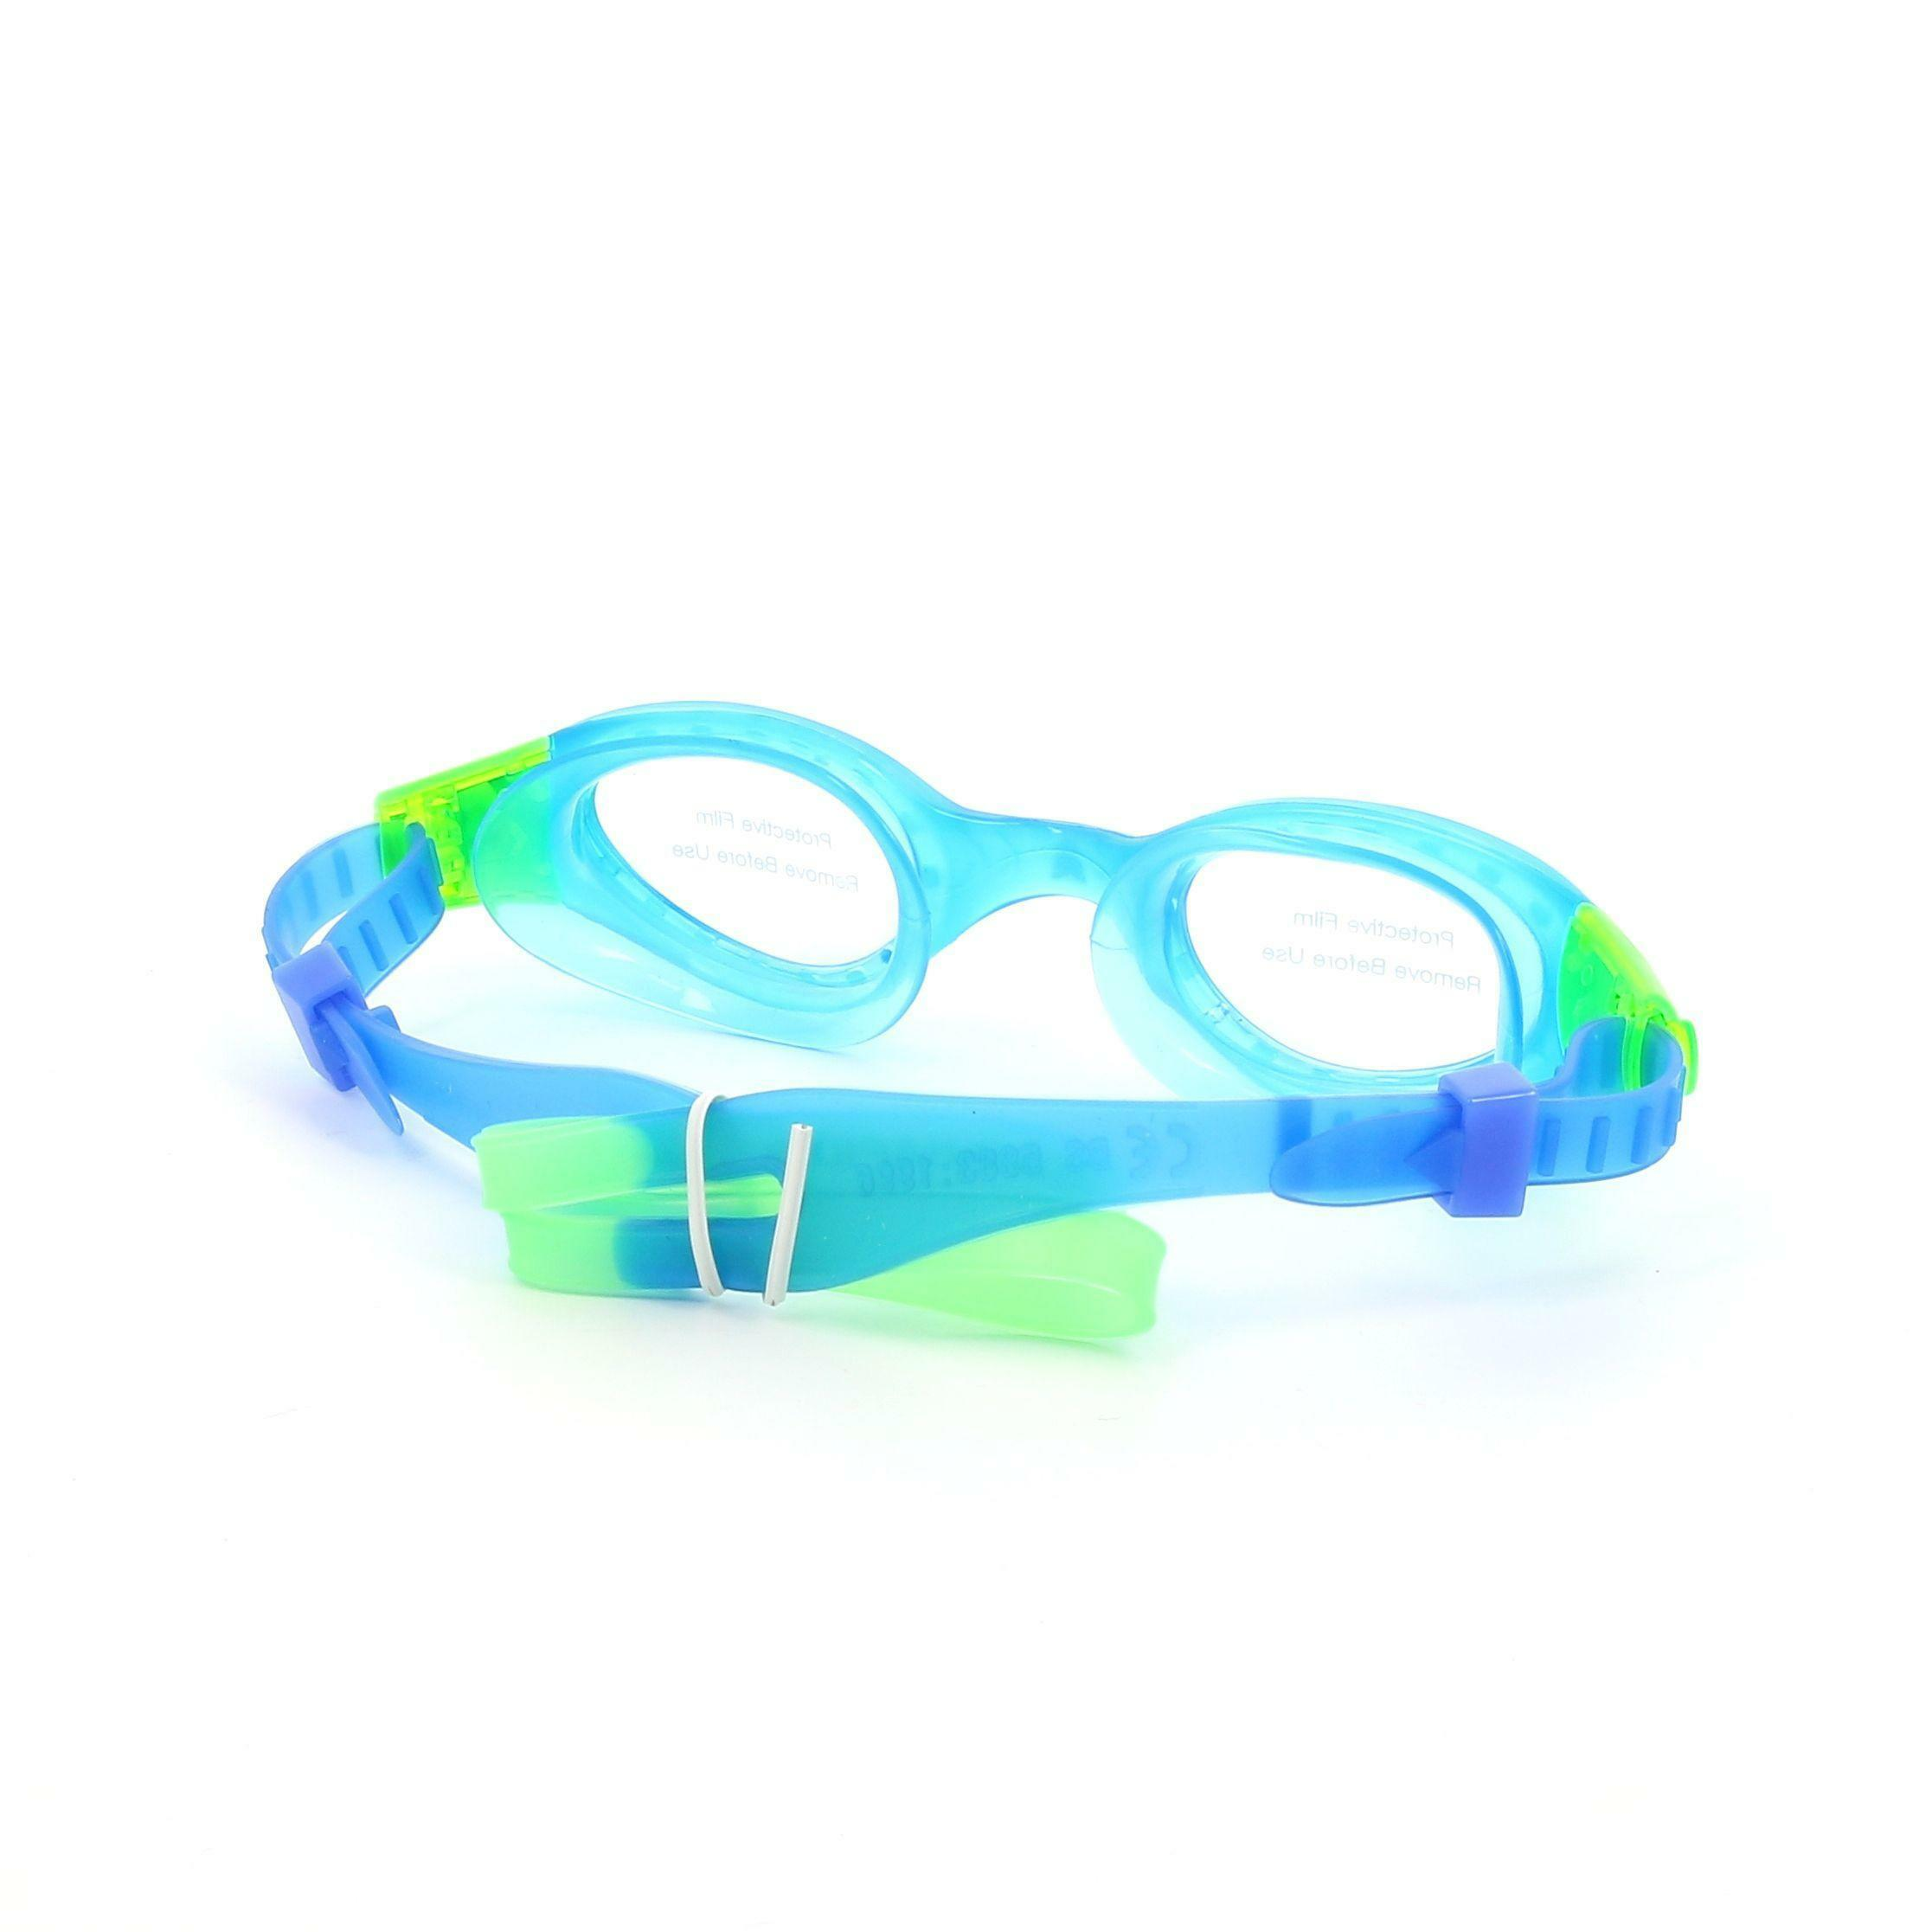 aquarapid aquarapid occhialino swapy jr bambino unisex blu